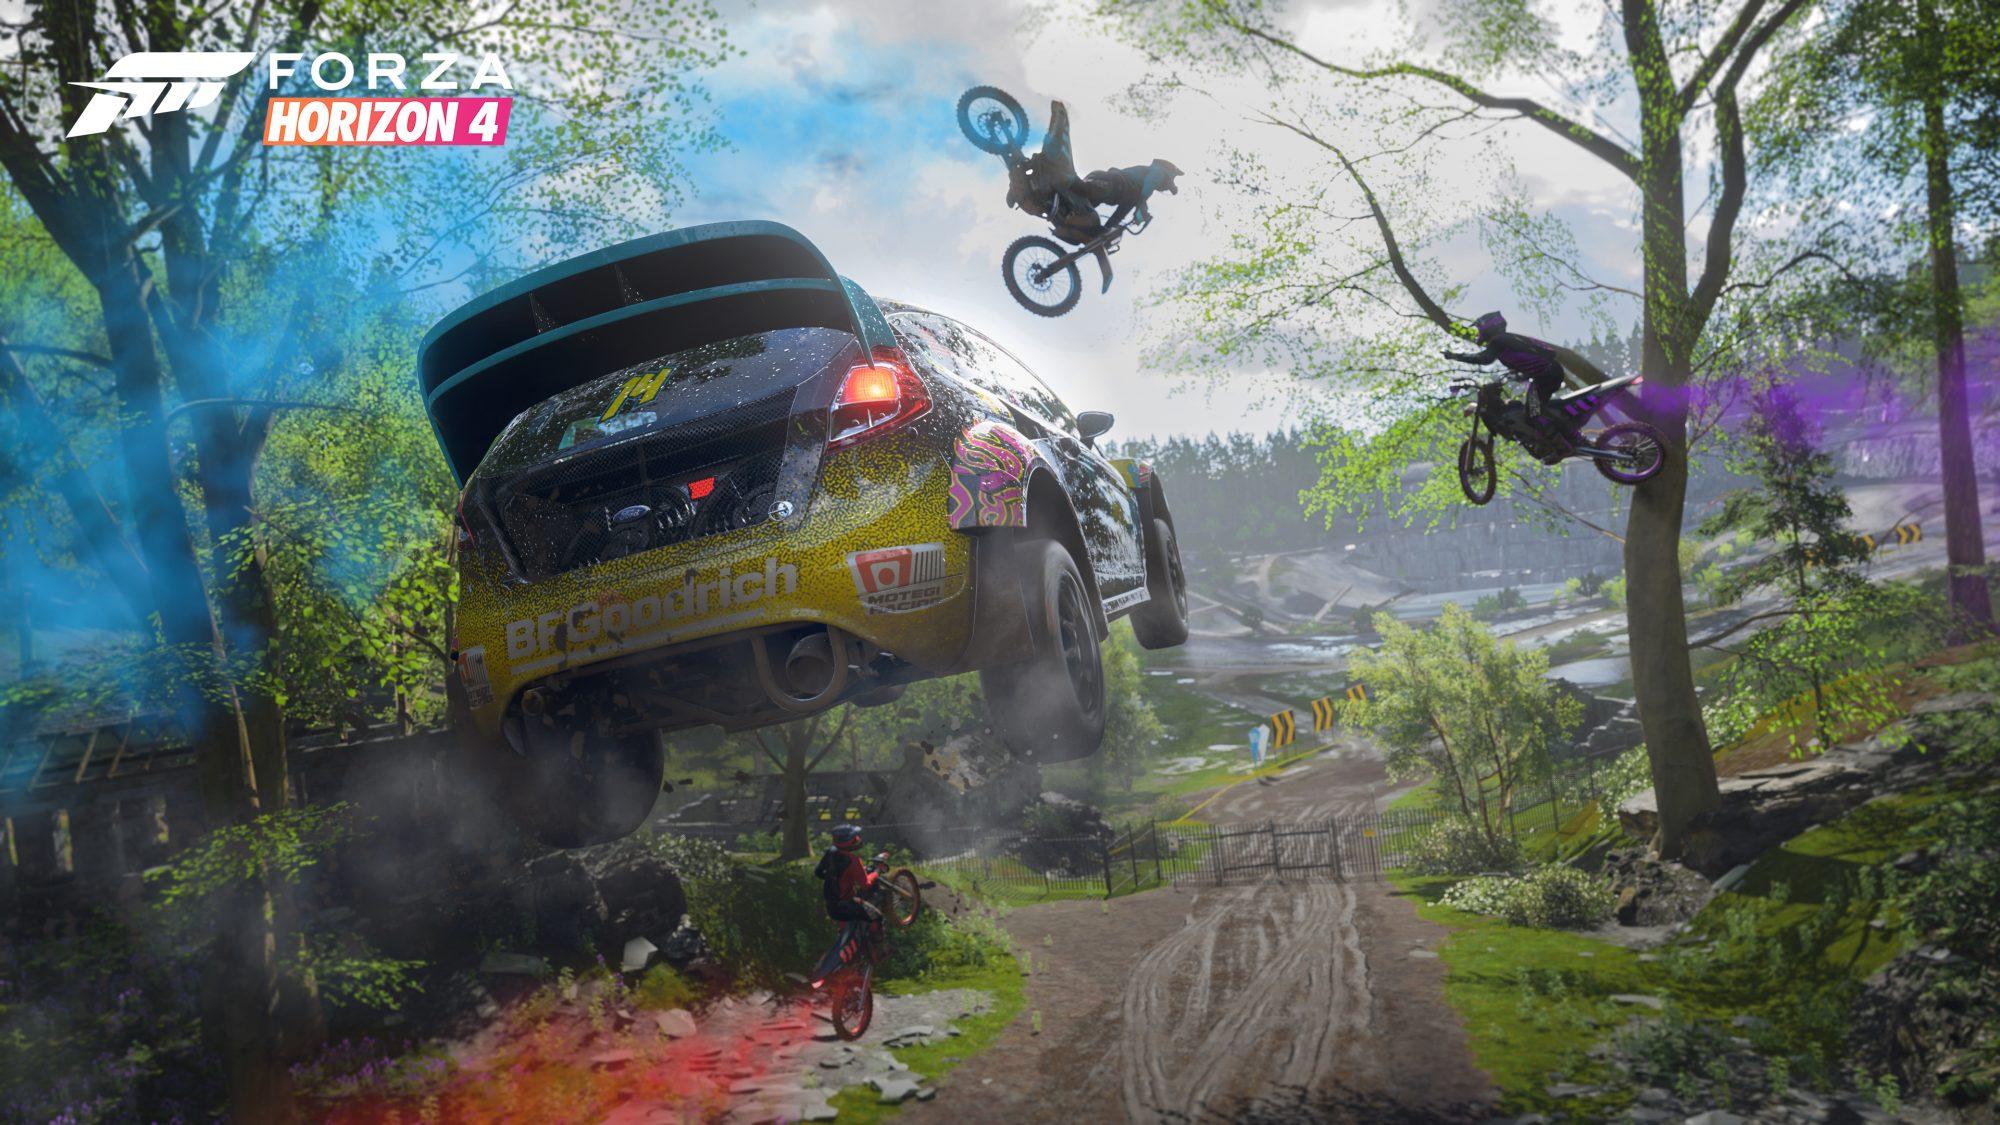 ForzaHorizon4 Gamescom WM 02 e1537825812226